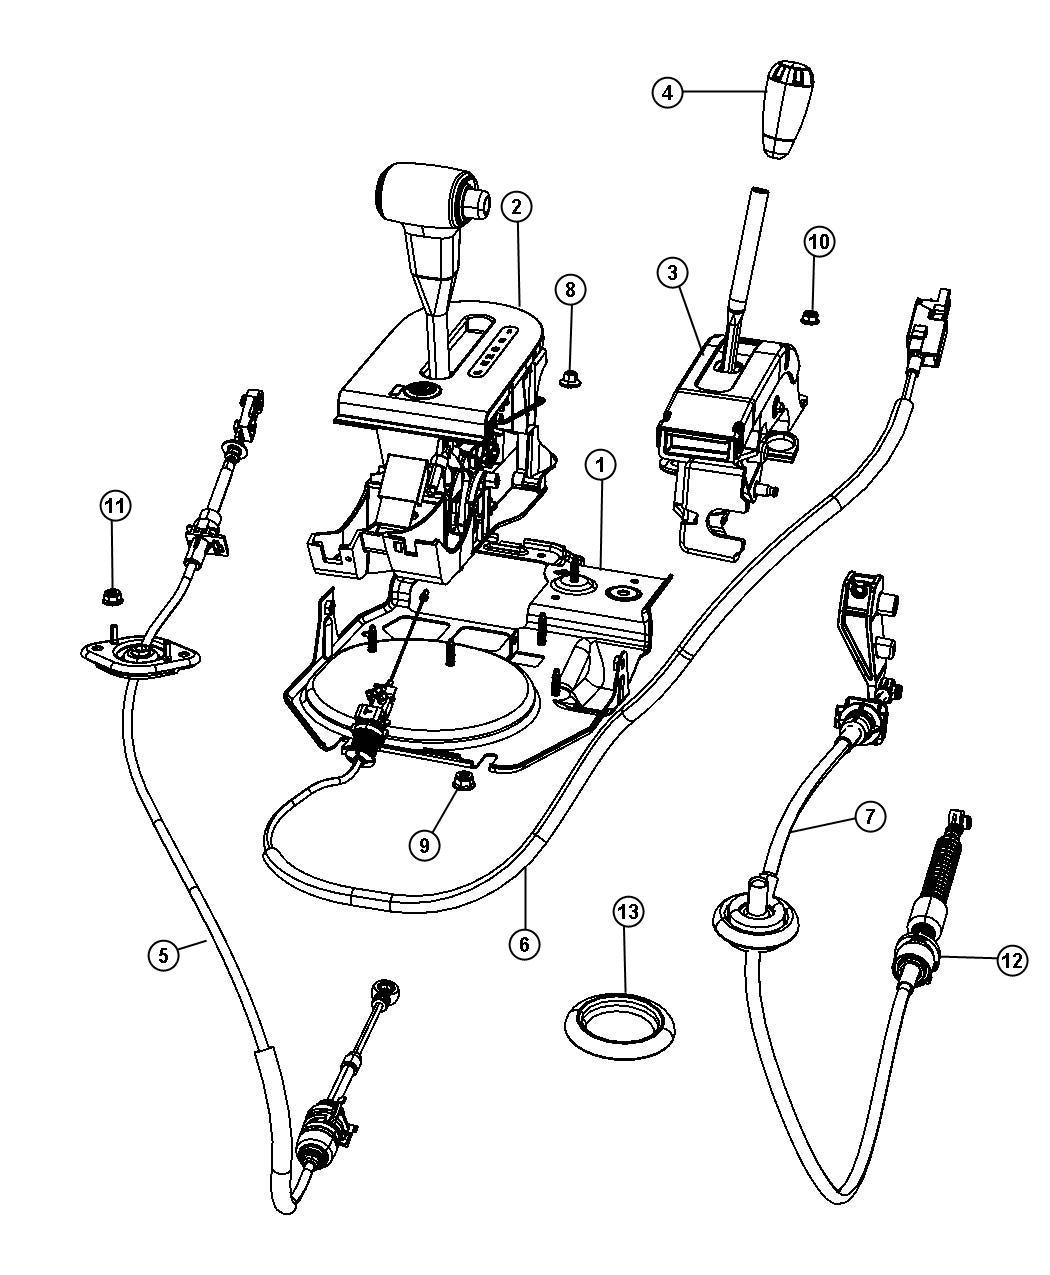 Jeep Wrangler Lever Auto Floor Shift